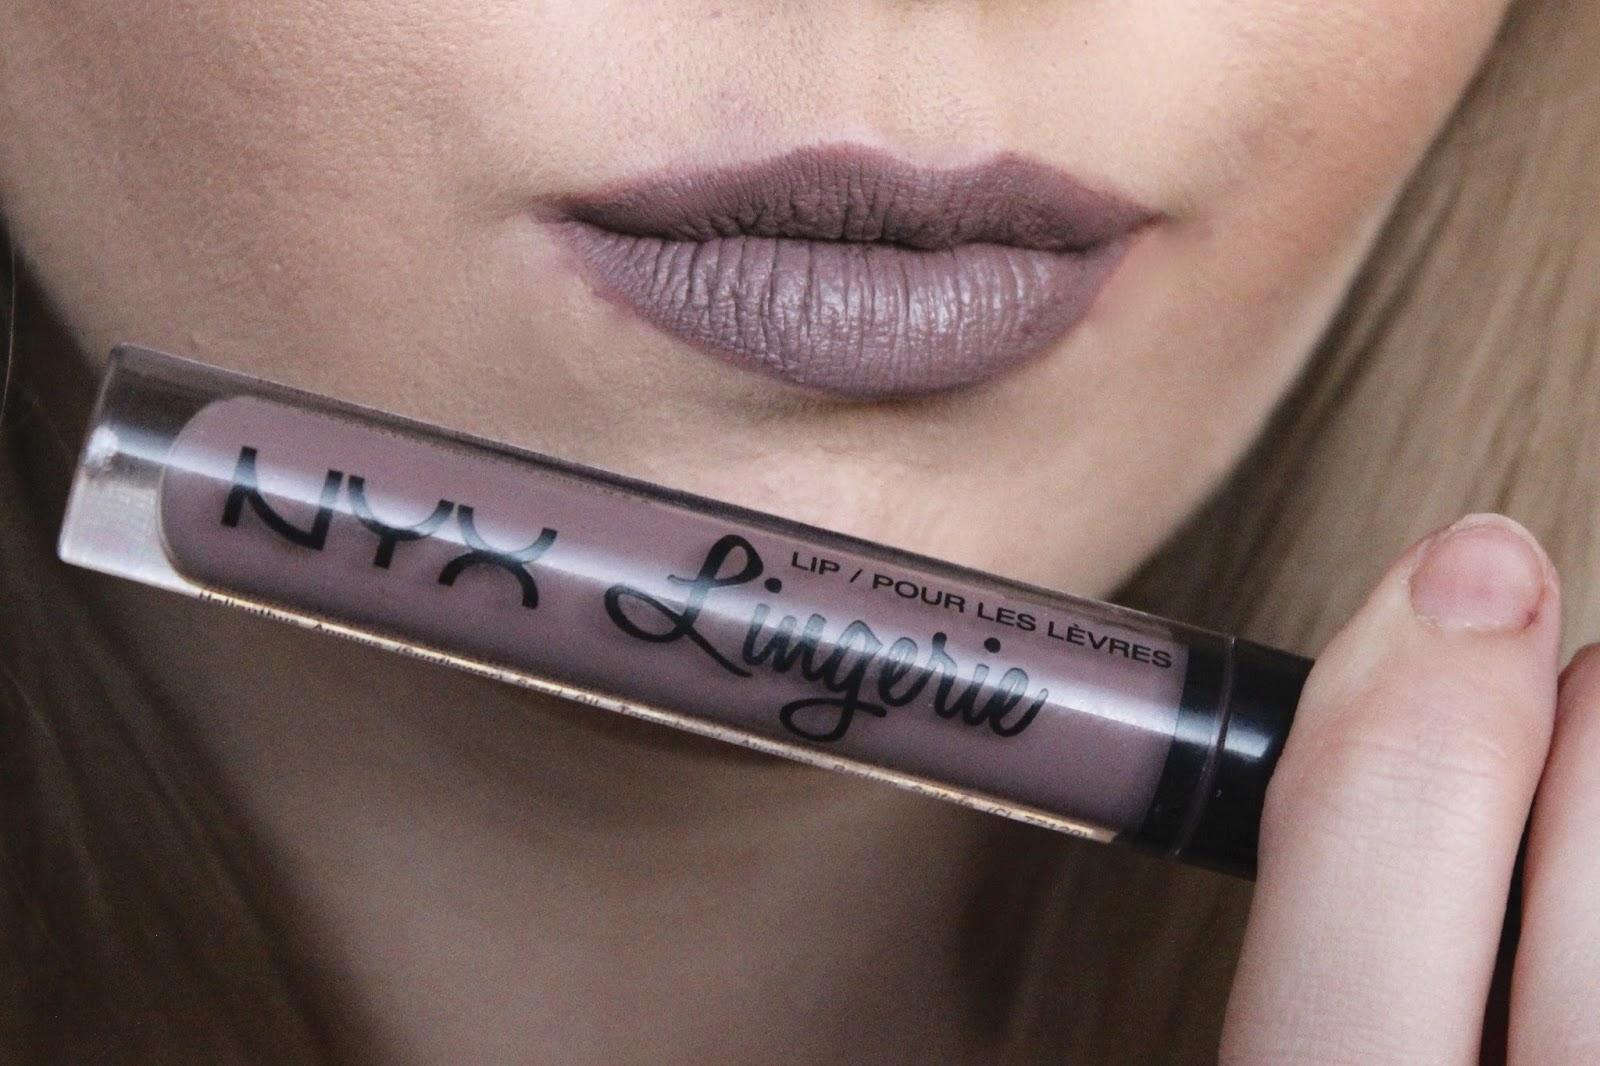 NYX lip lingerie in embellishment  purple lipstick loved by sarah blog